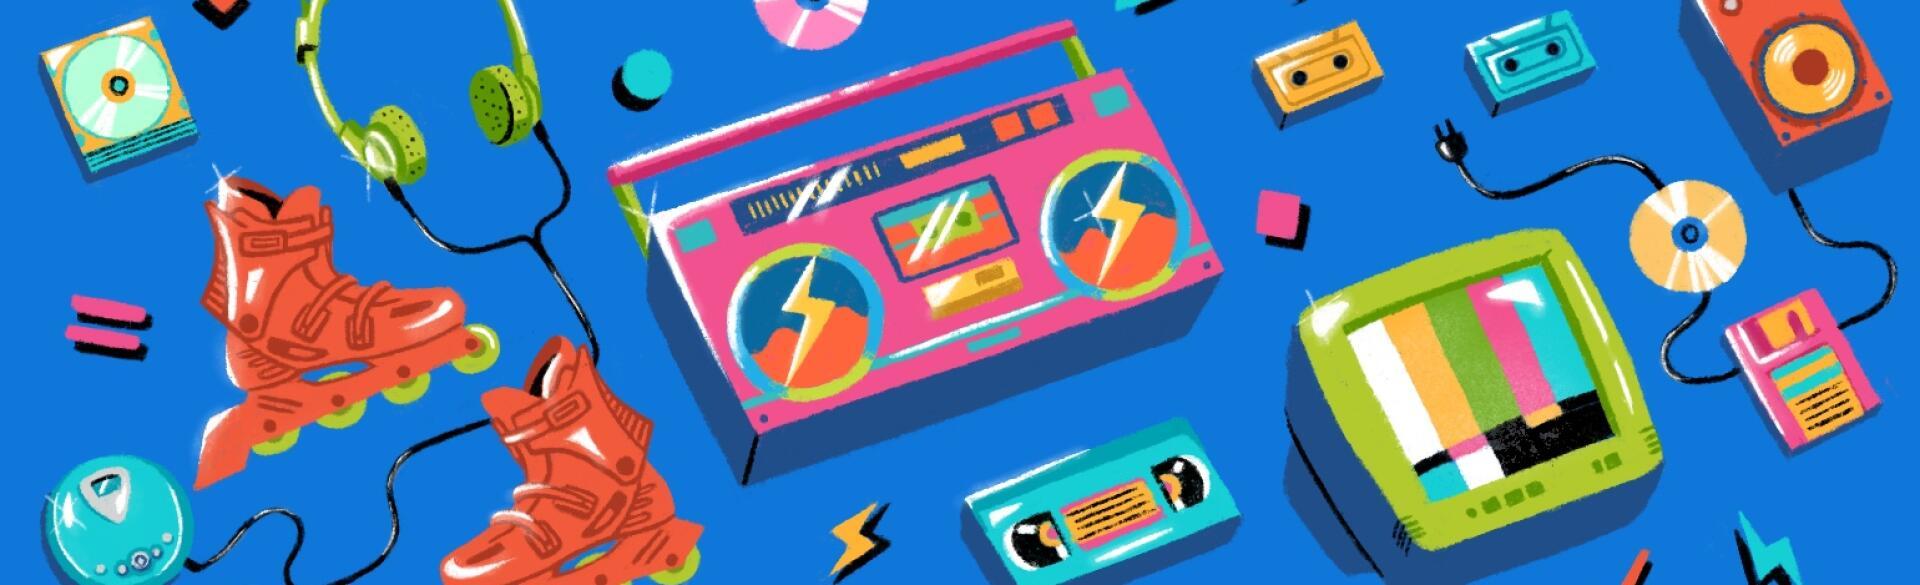 illustration of 90s electronics music playlist